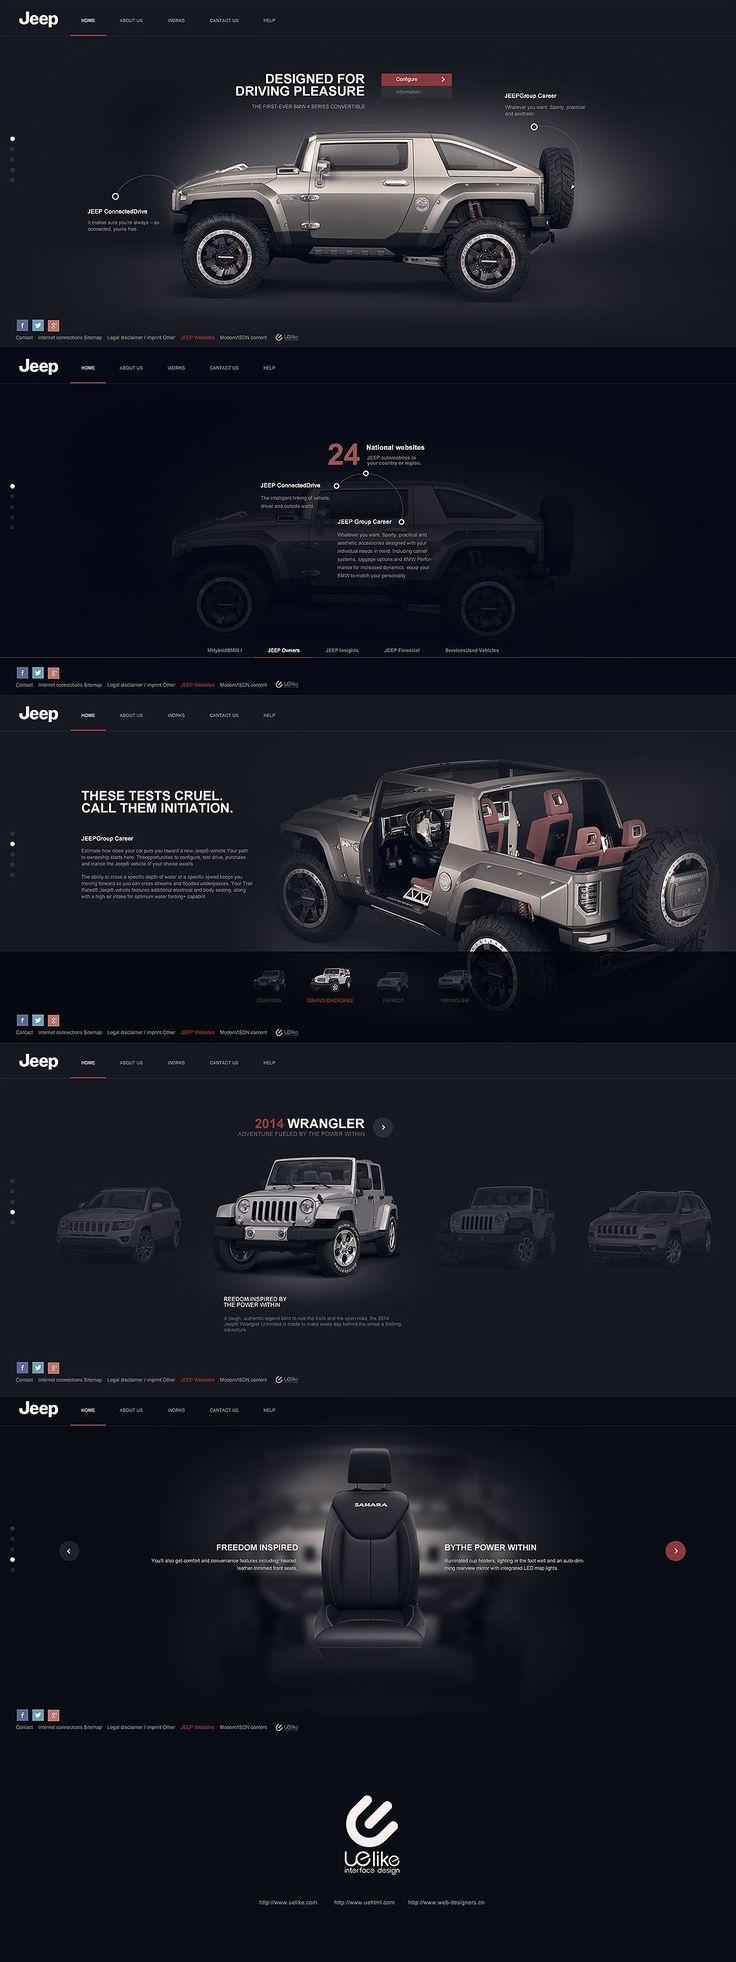 Best Product Sites » Jeep